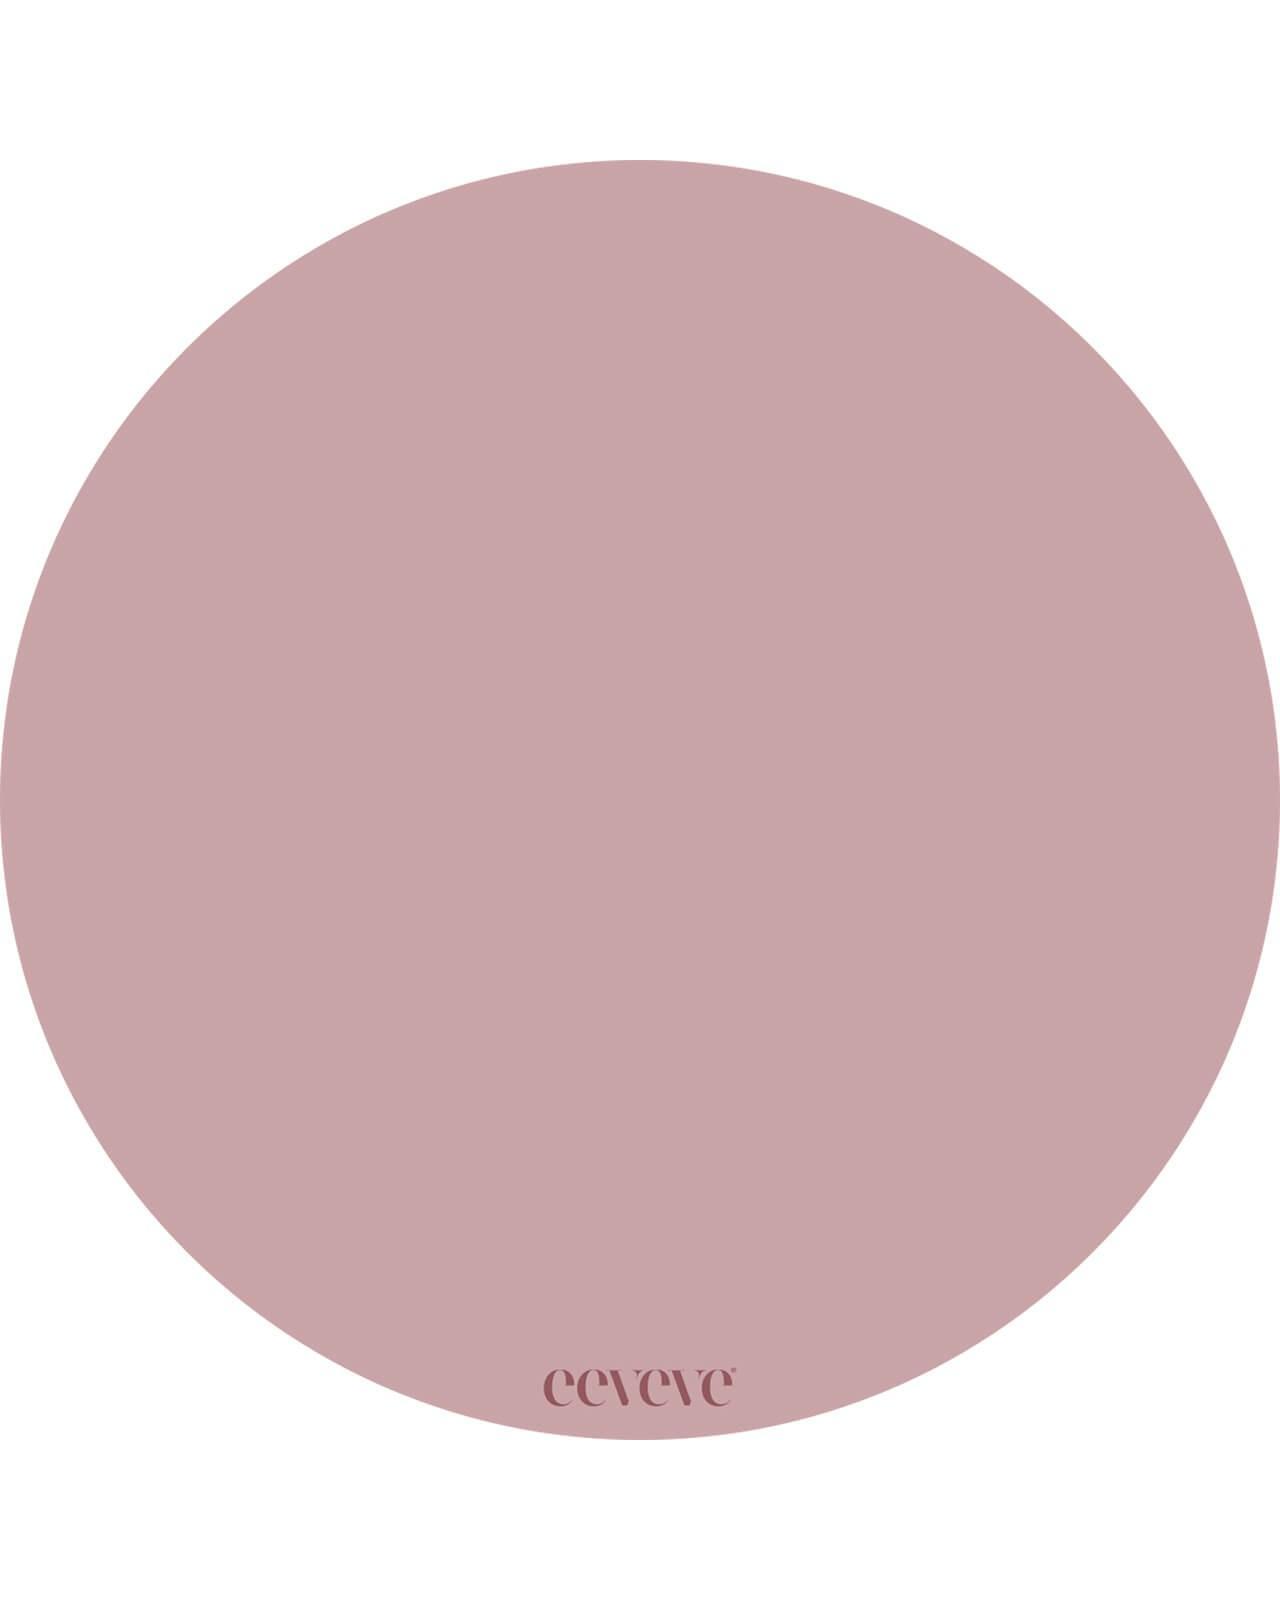 Eeveve - 12x Onderleggers Old Pink